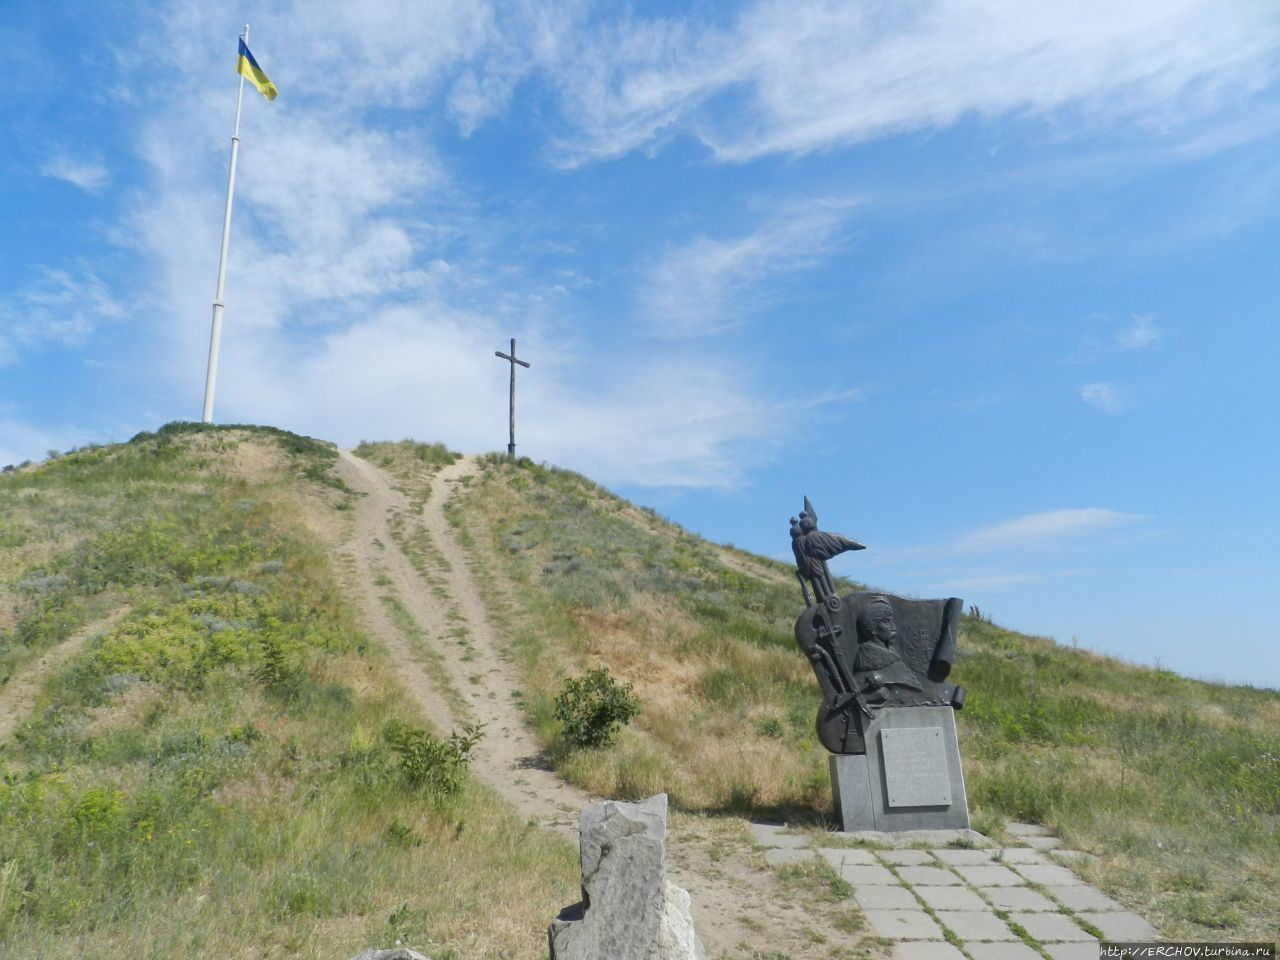 Пешком по острову Хортица Хортица, Украина